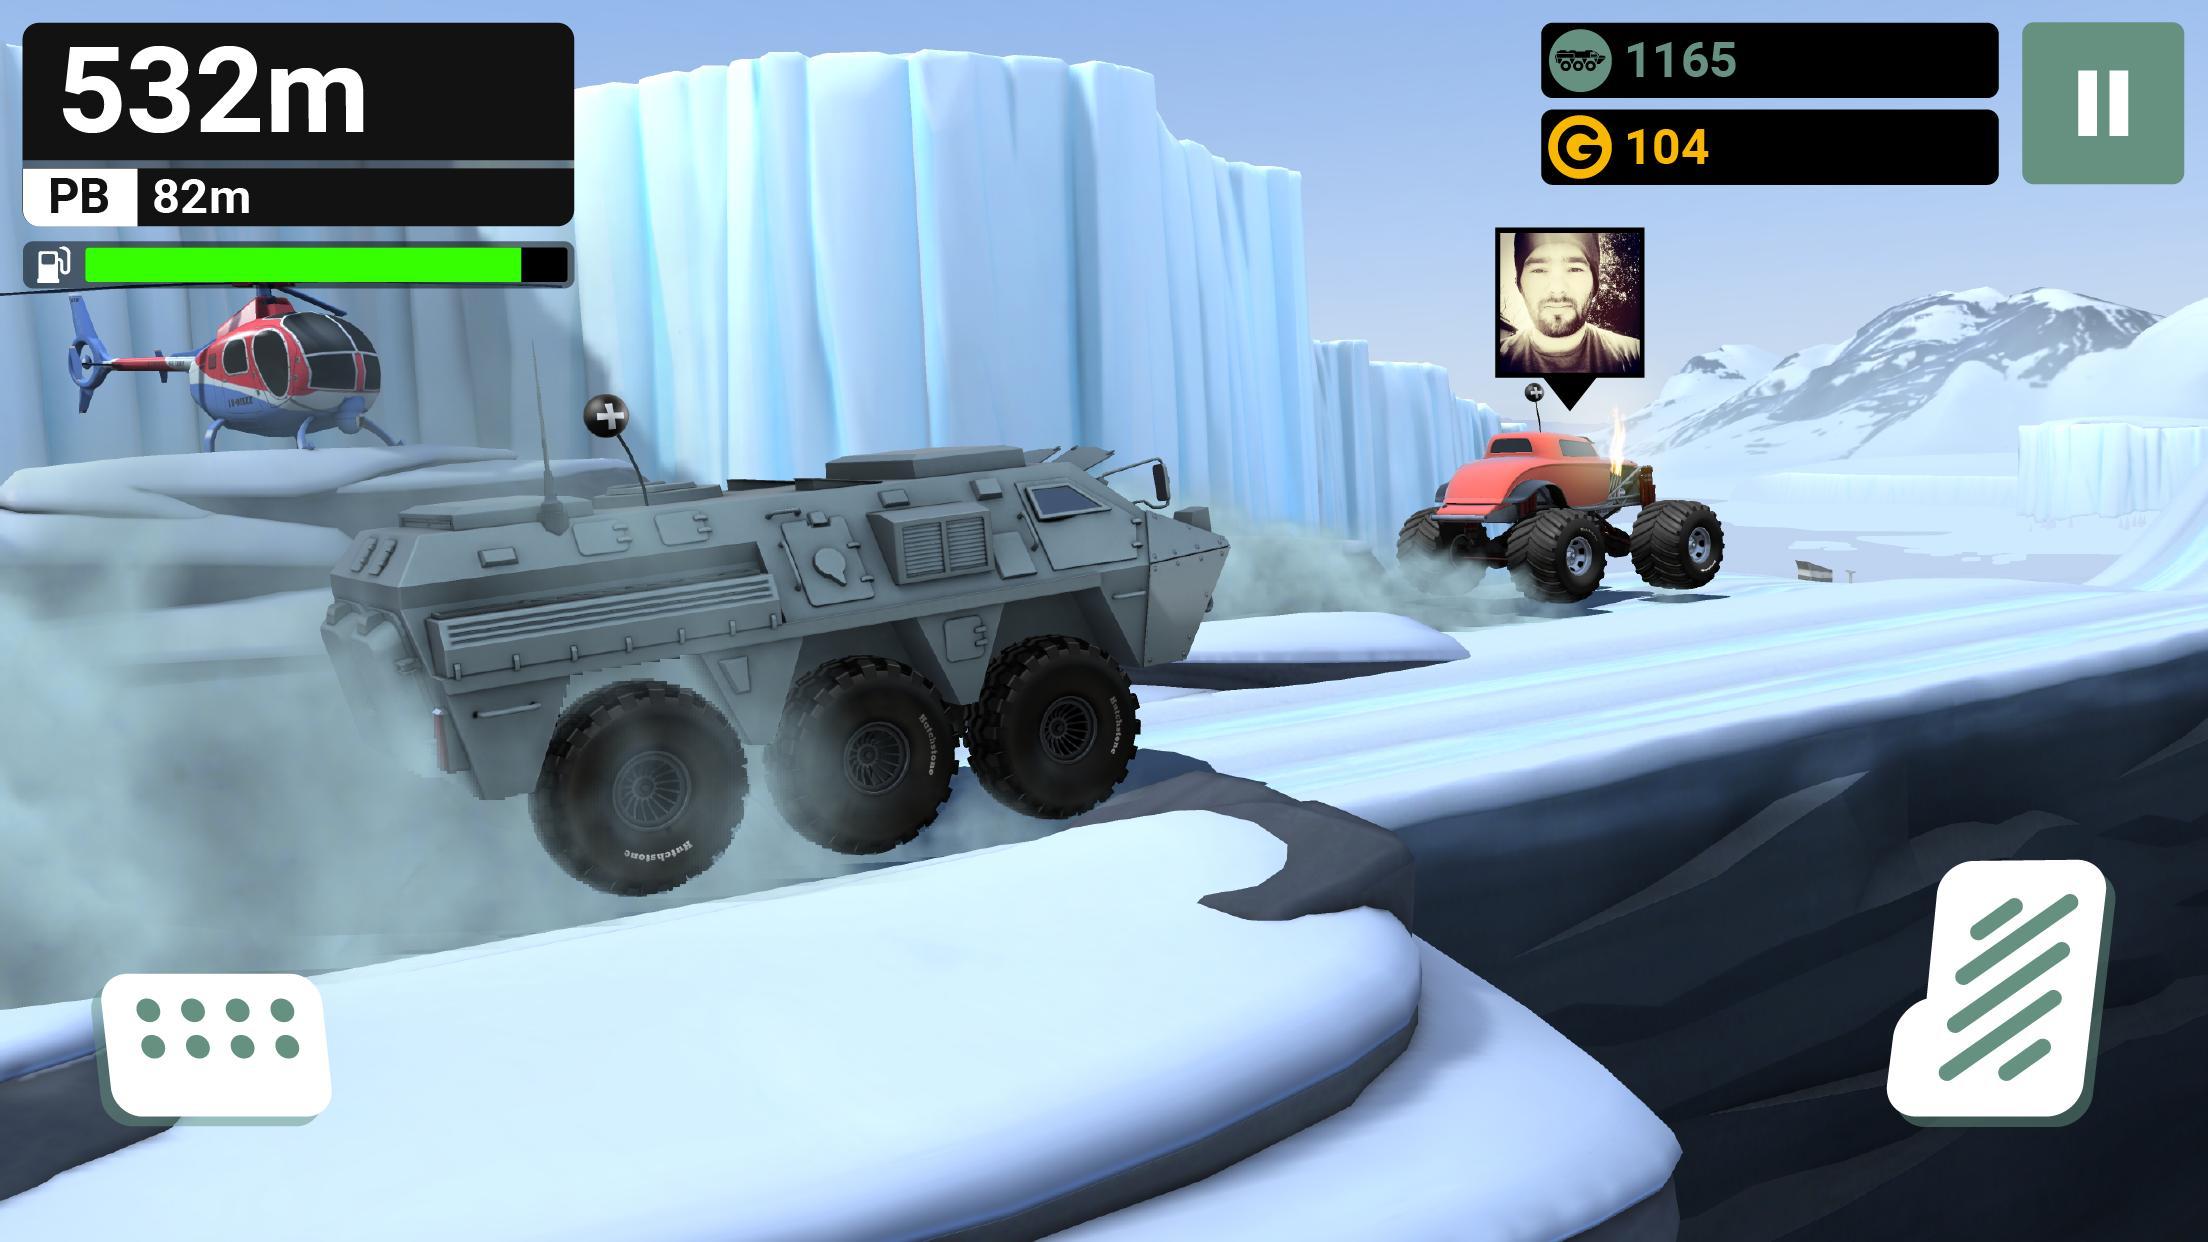 MMX Hill Dash 1.11626 Screenshot 6